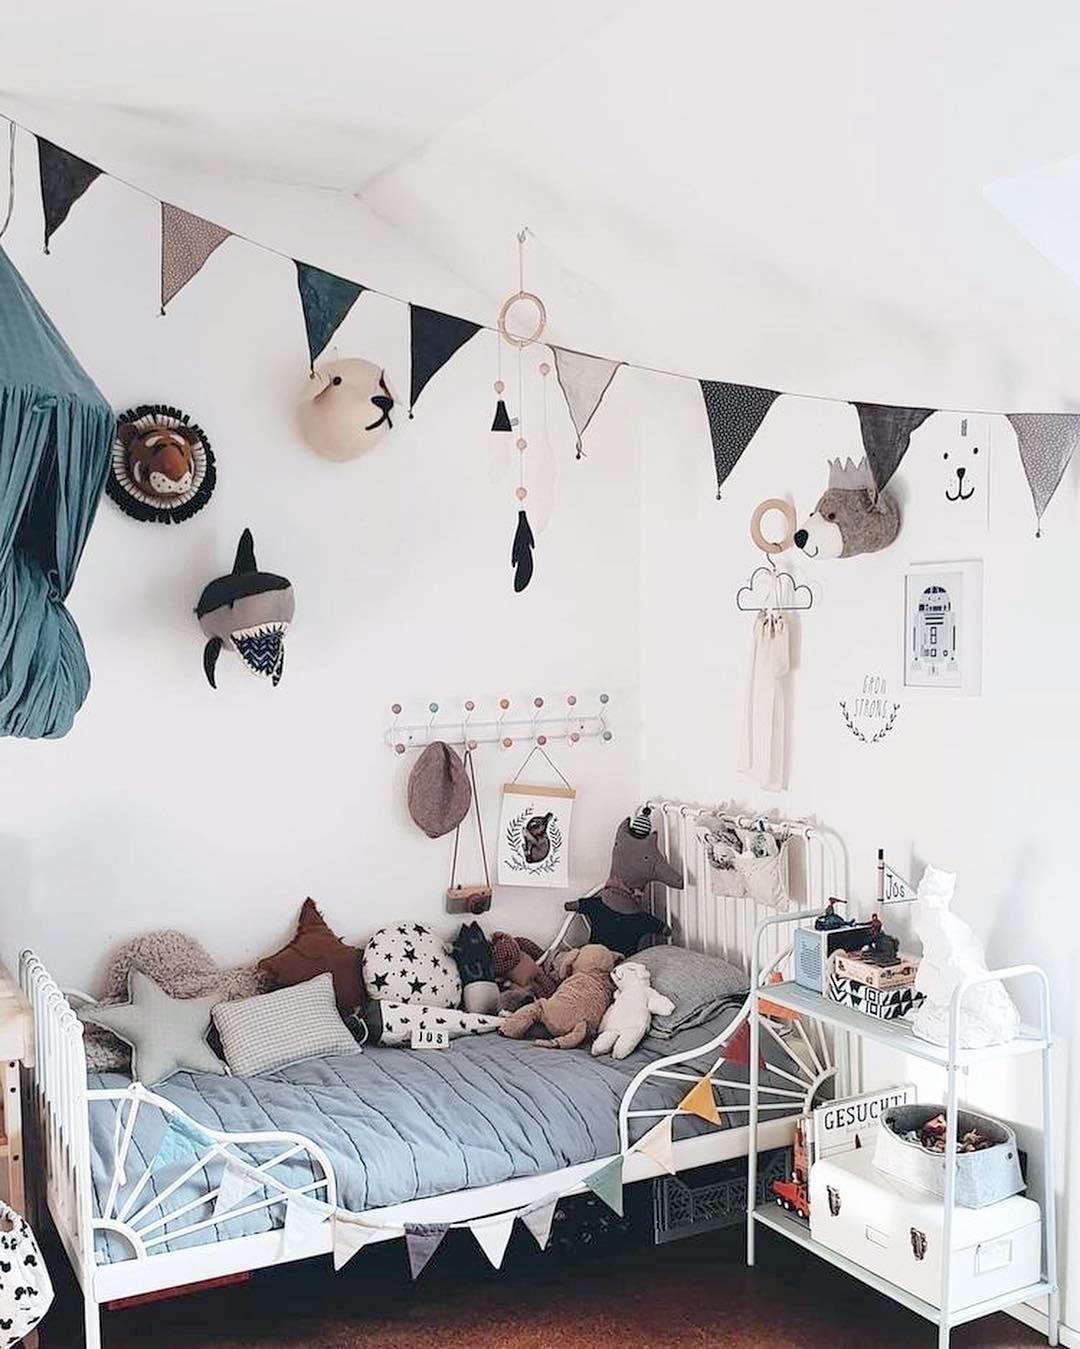 Фото: Instagram love_scandi_kids